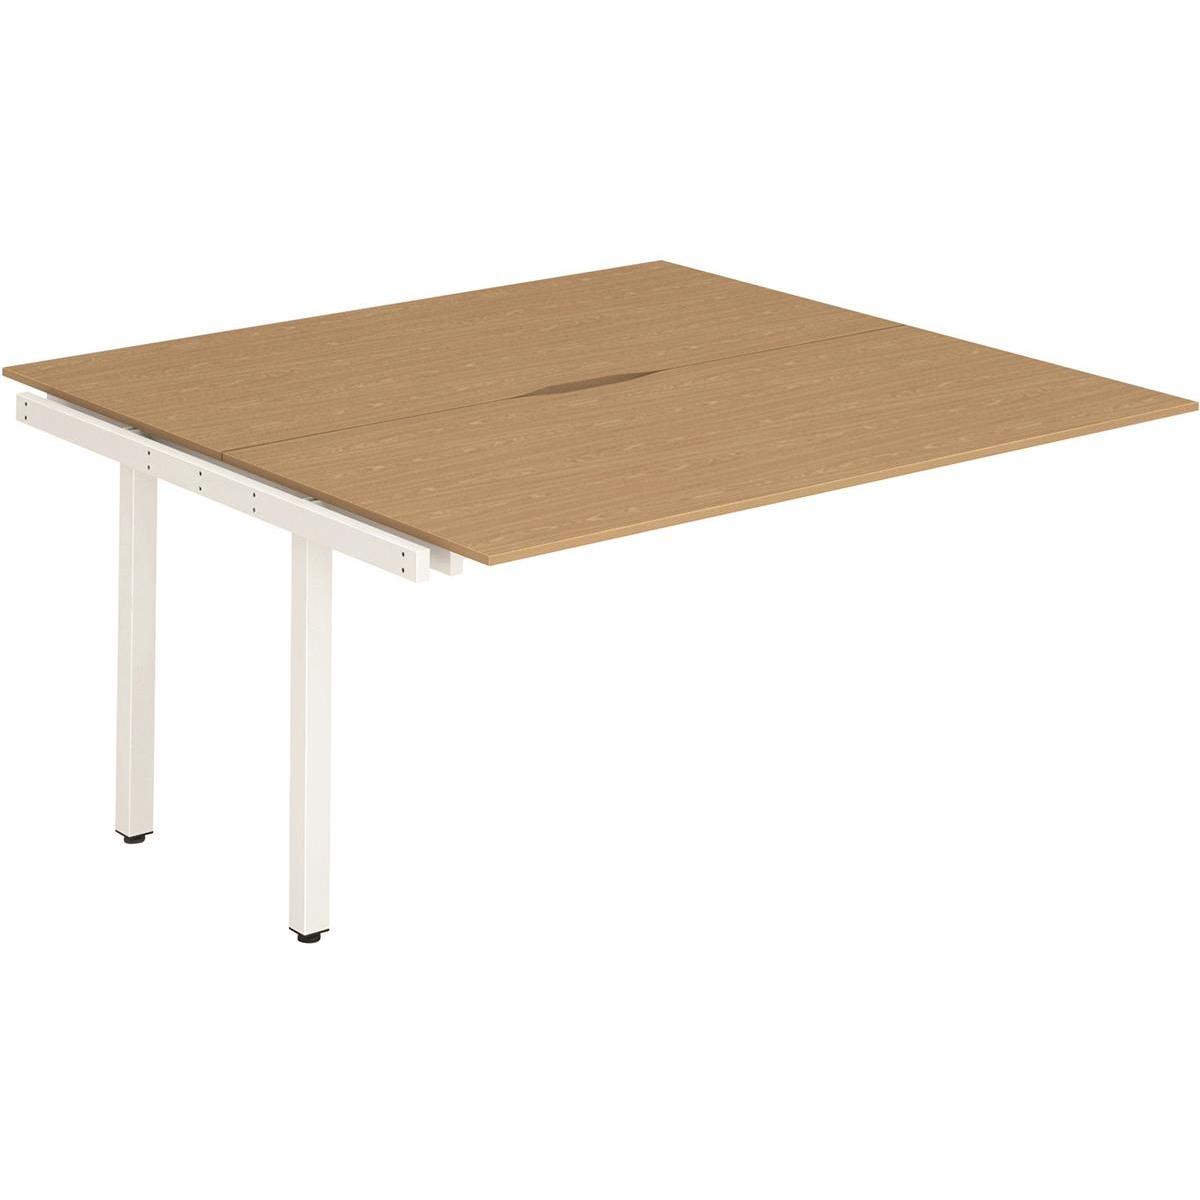 Trexus Bench Desk Double Extension Back to Back Configuration White Leg 1400x1600mm Oak Ref BE193